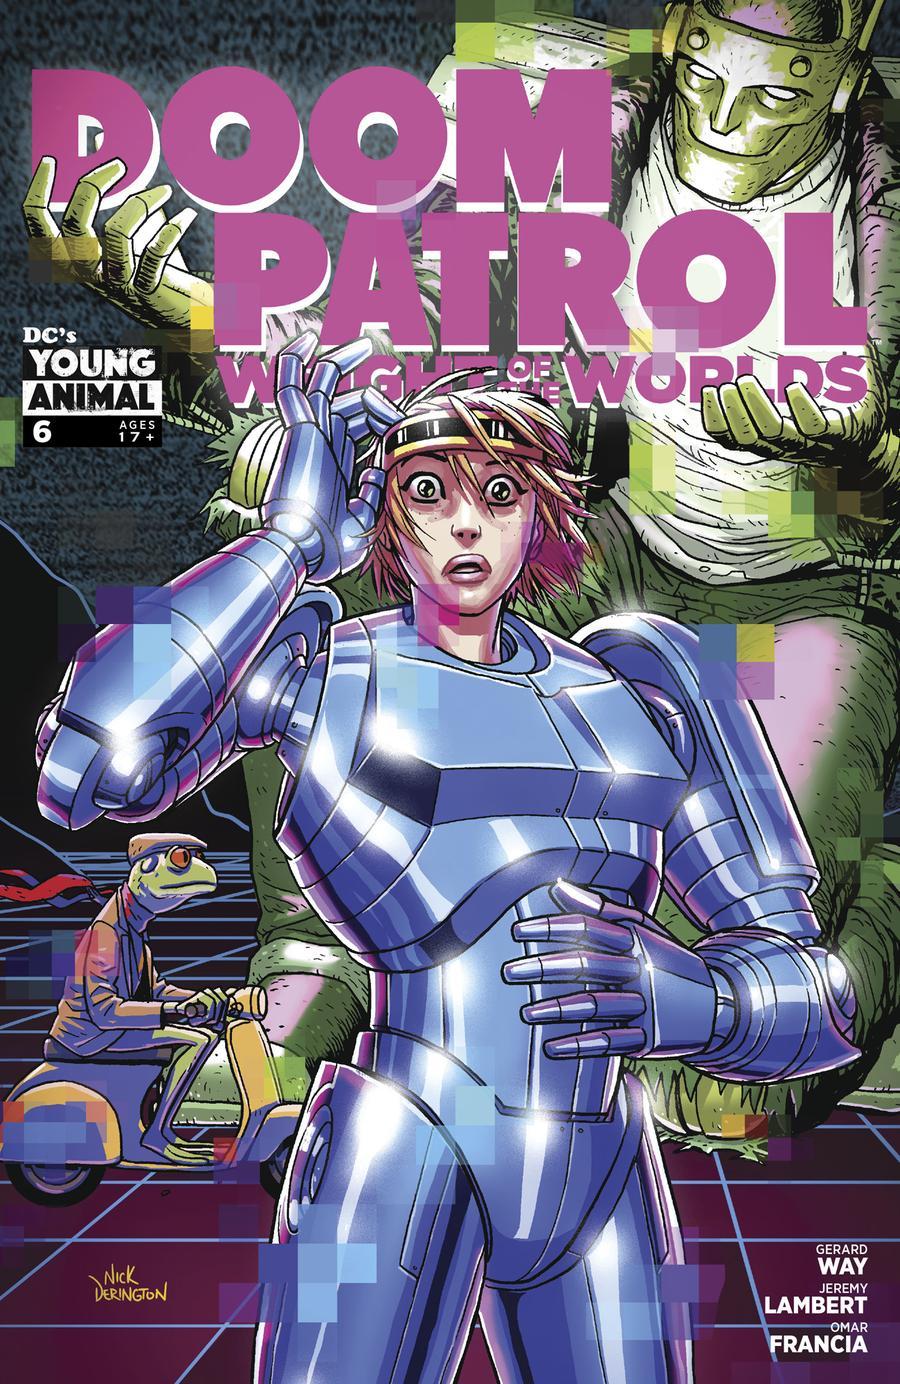 Doom Patrol Weight Of The Worlds #6